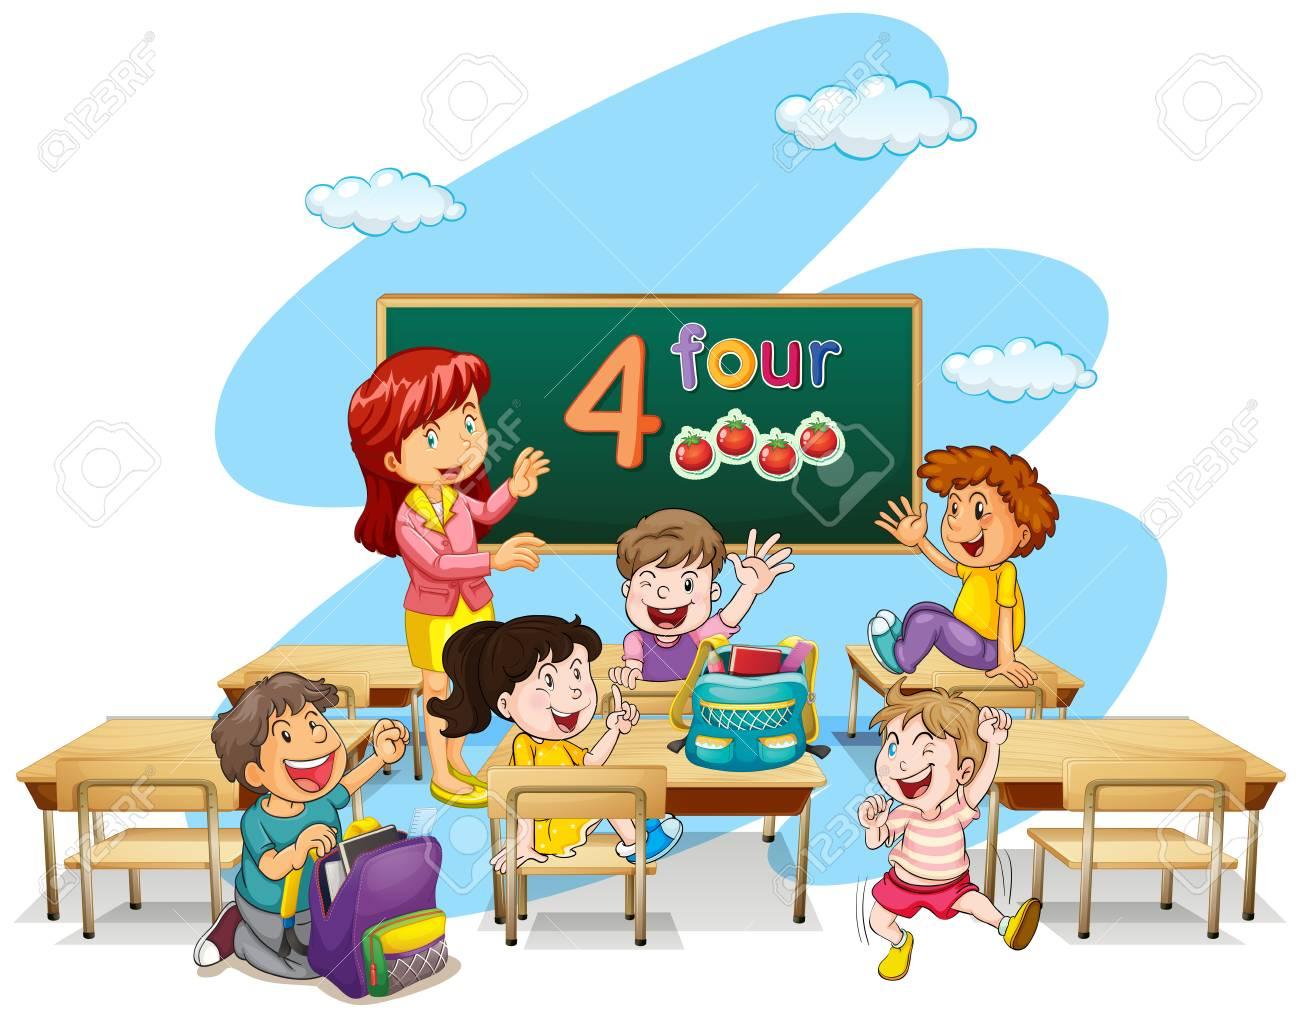 teacher teaching students in classroom illustration royalty free